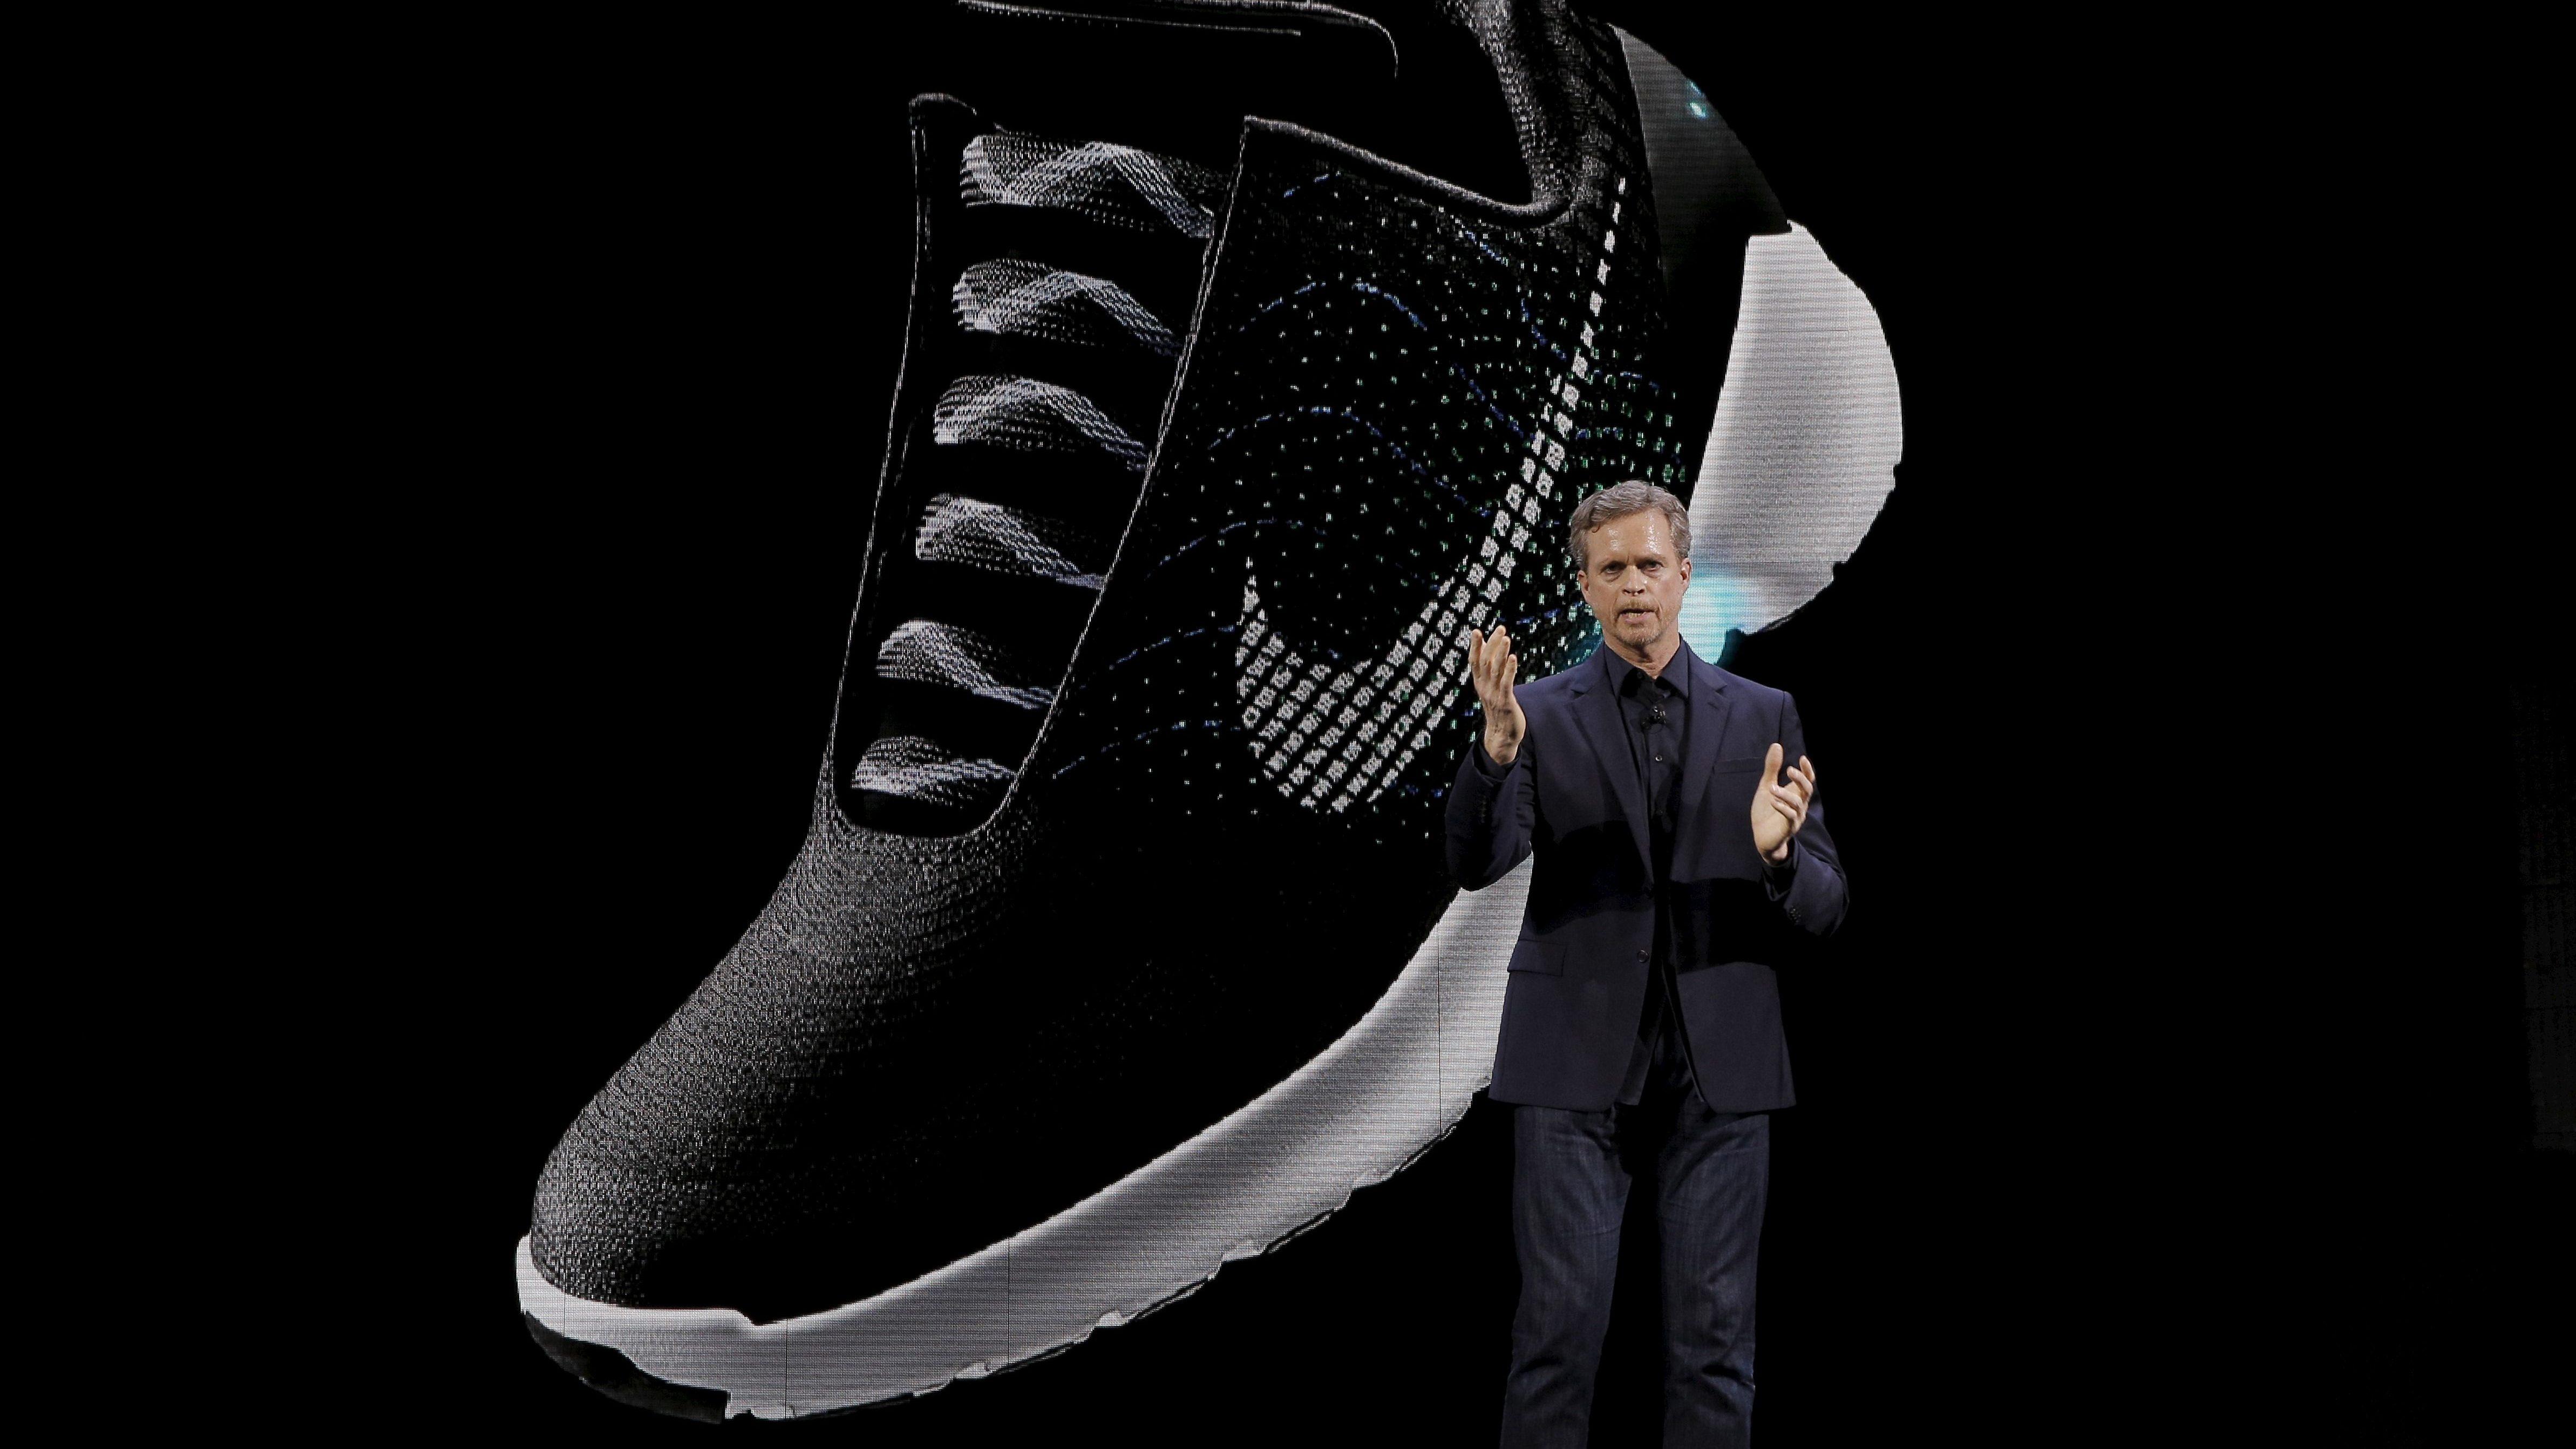 First Look: Nike's POWER LACING Shoe Nike HyperAdapt 1.0